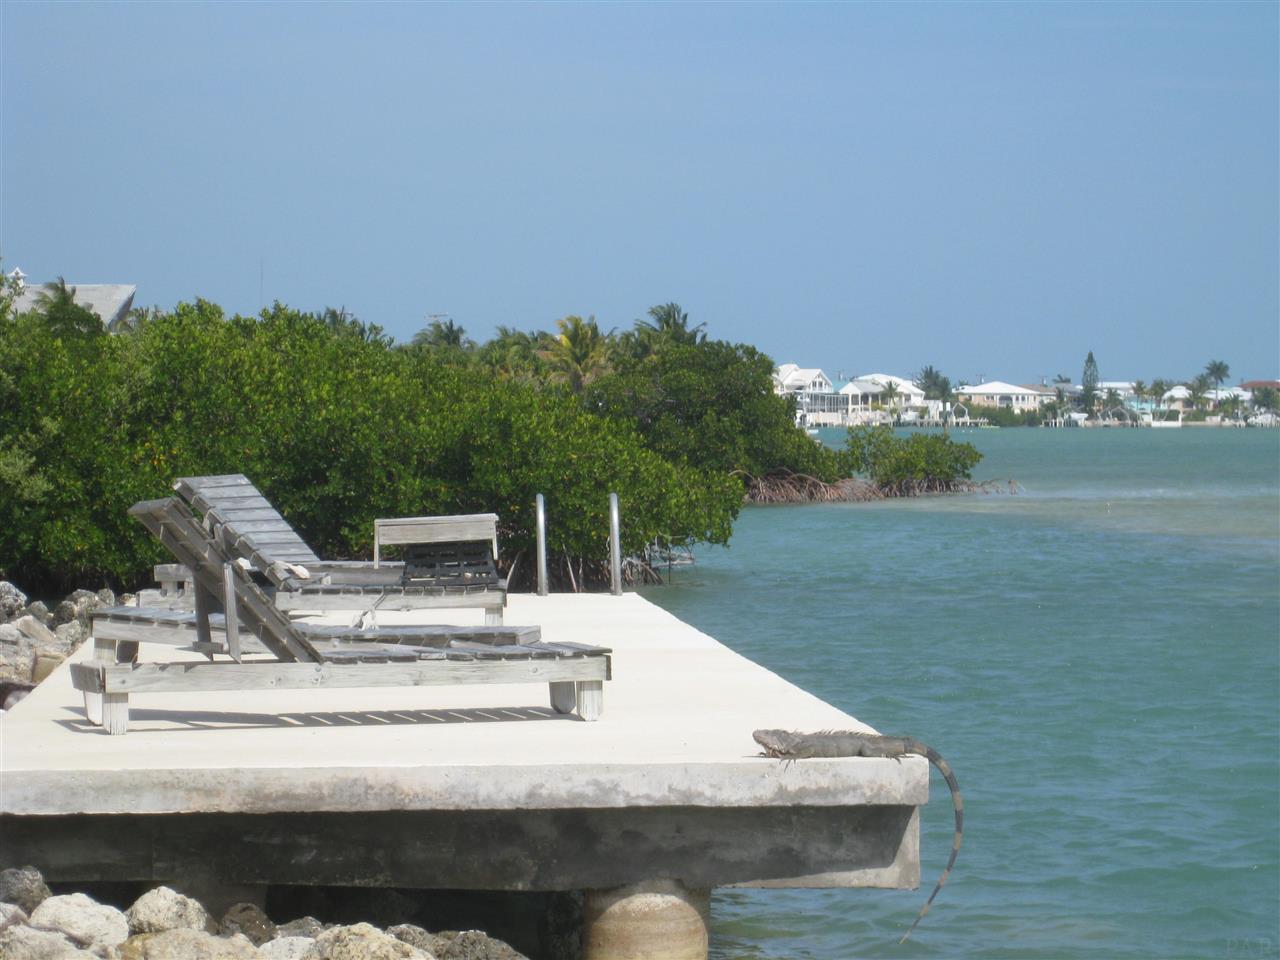 Lot 8 Overseas Hwy, Summerland Key, FL 33042